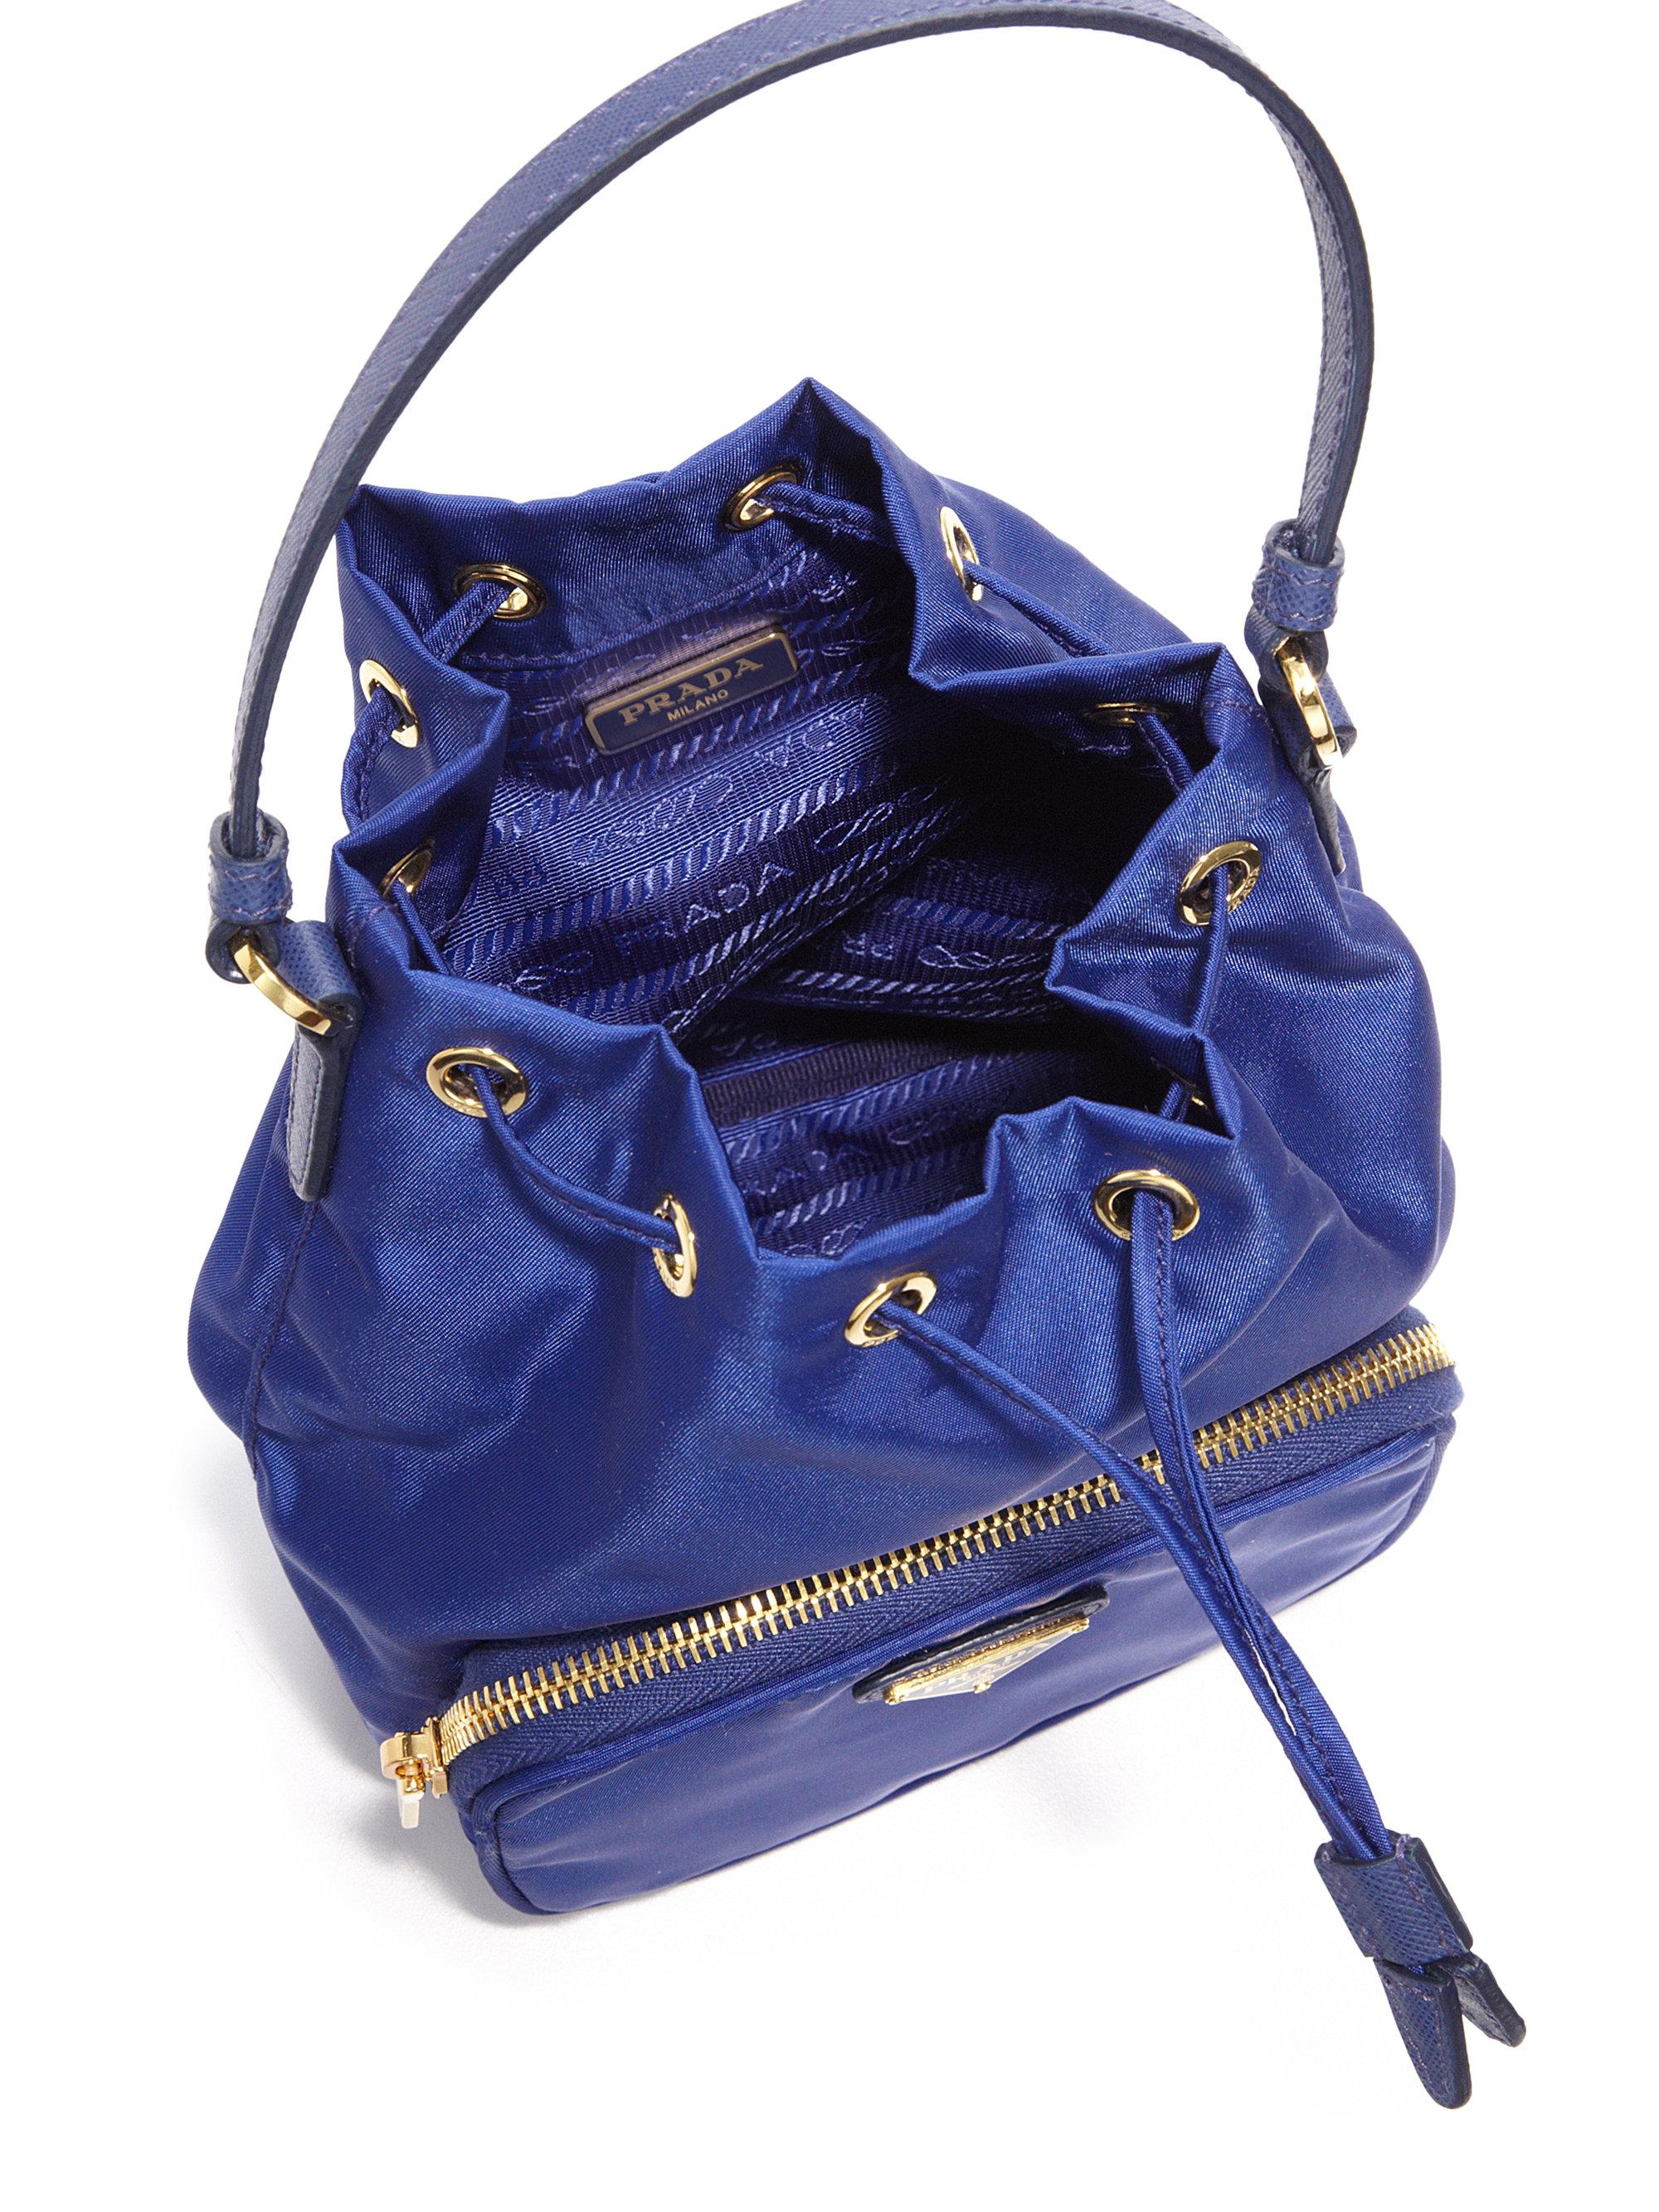 Prada Mini Nylon \u0026amp; Leather Bucket Bag in Black | Lyst